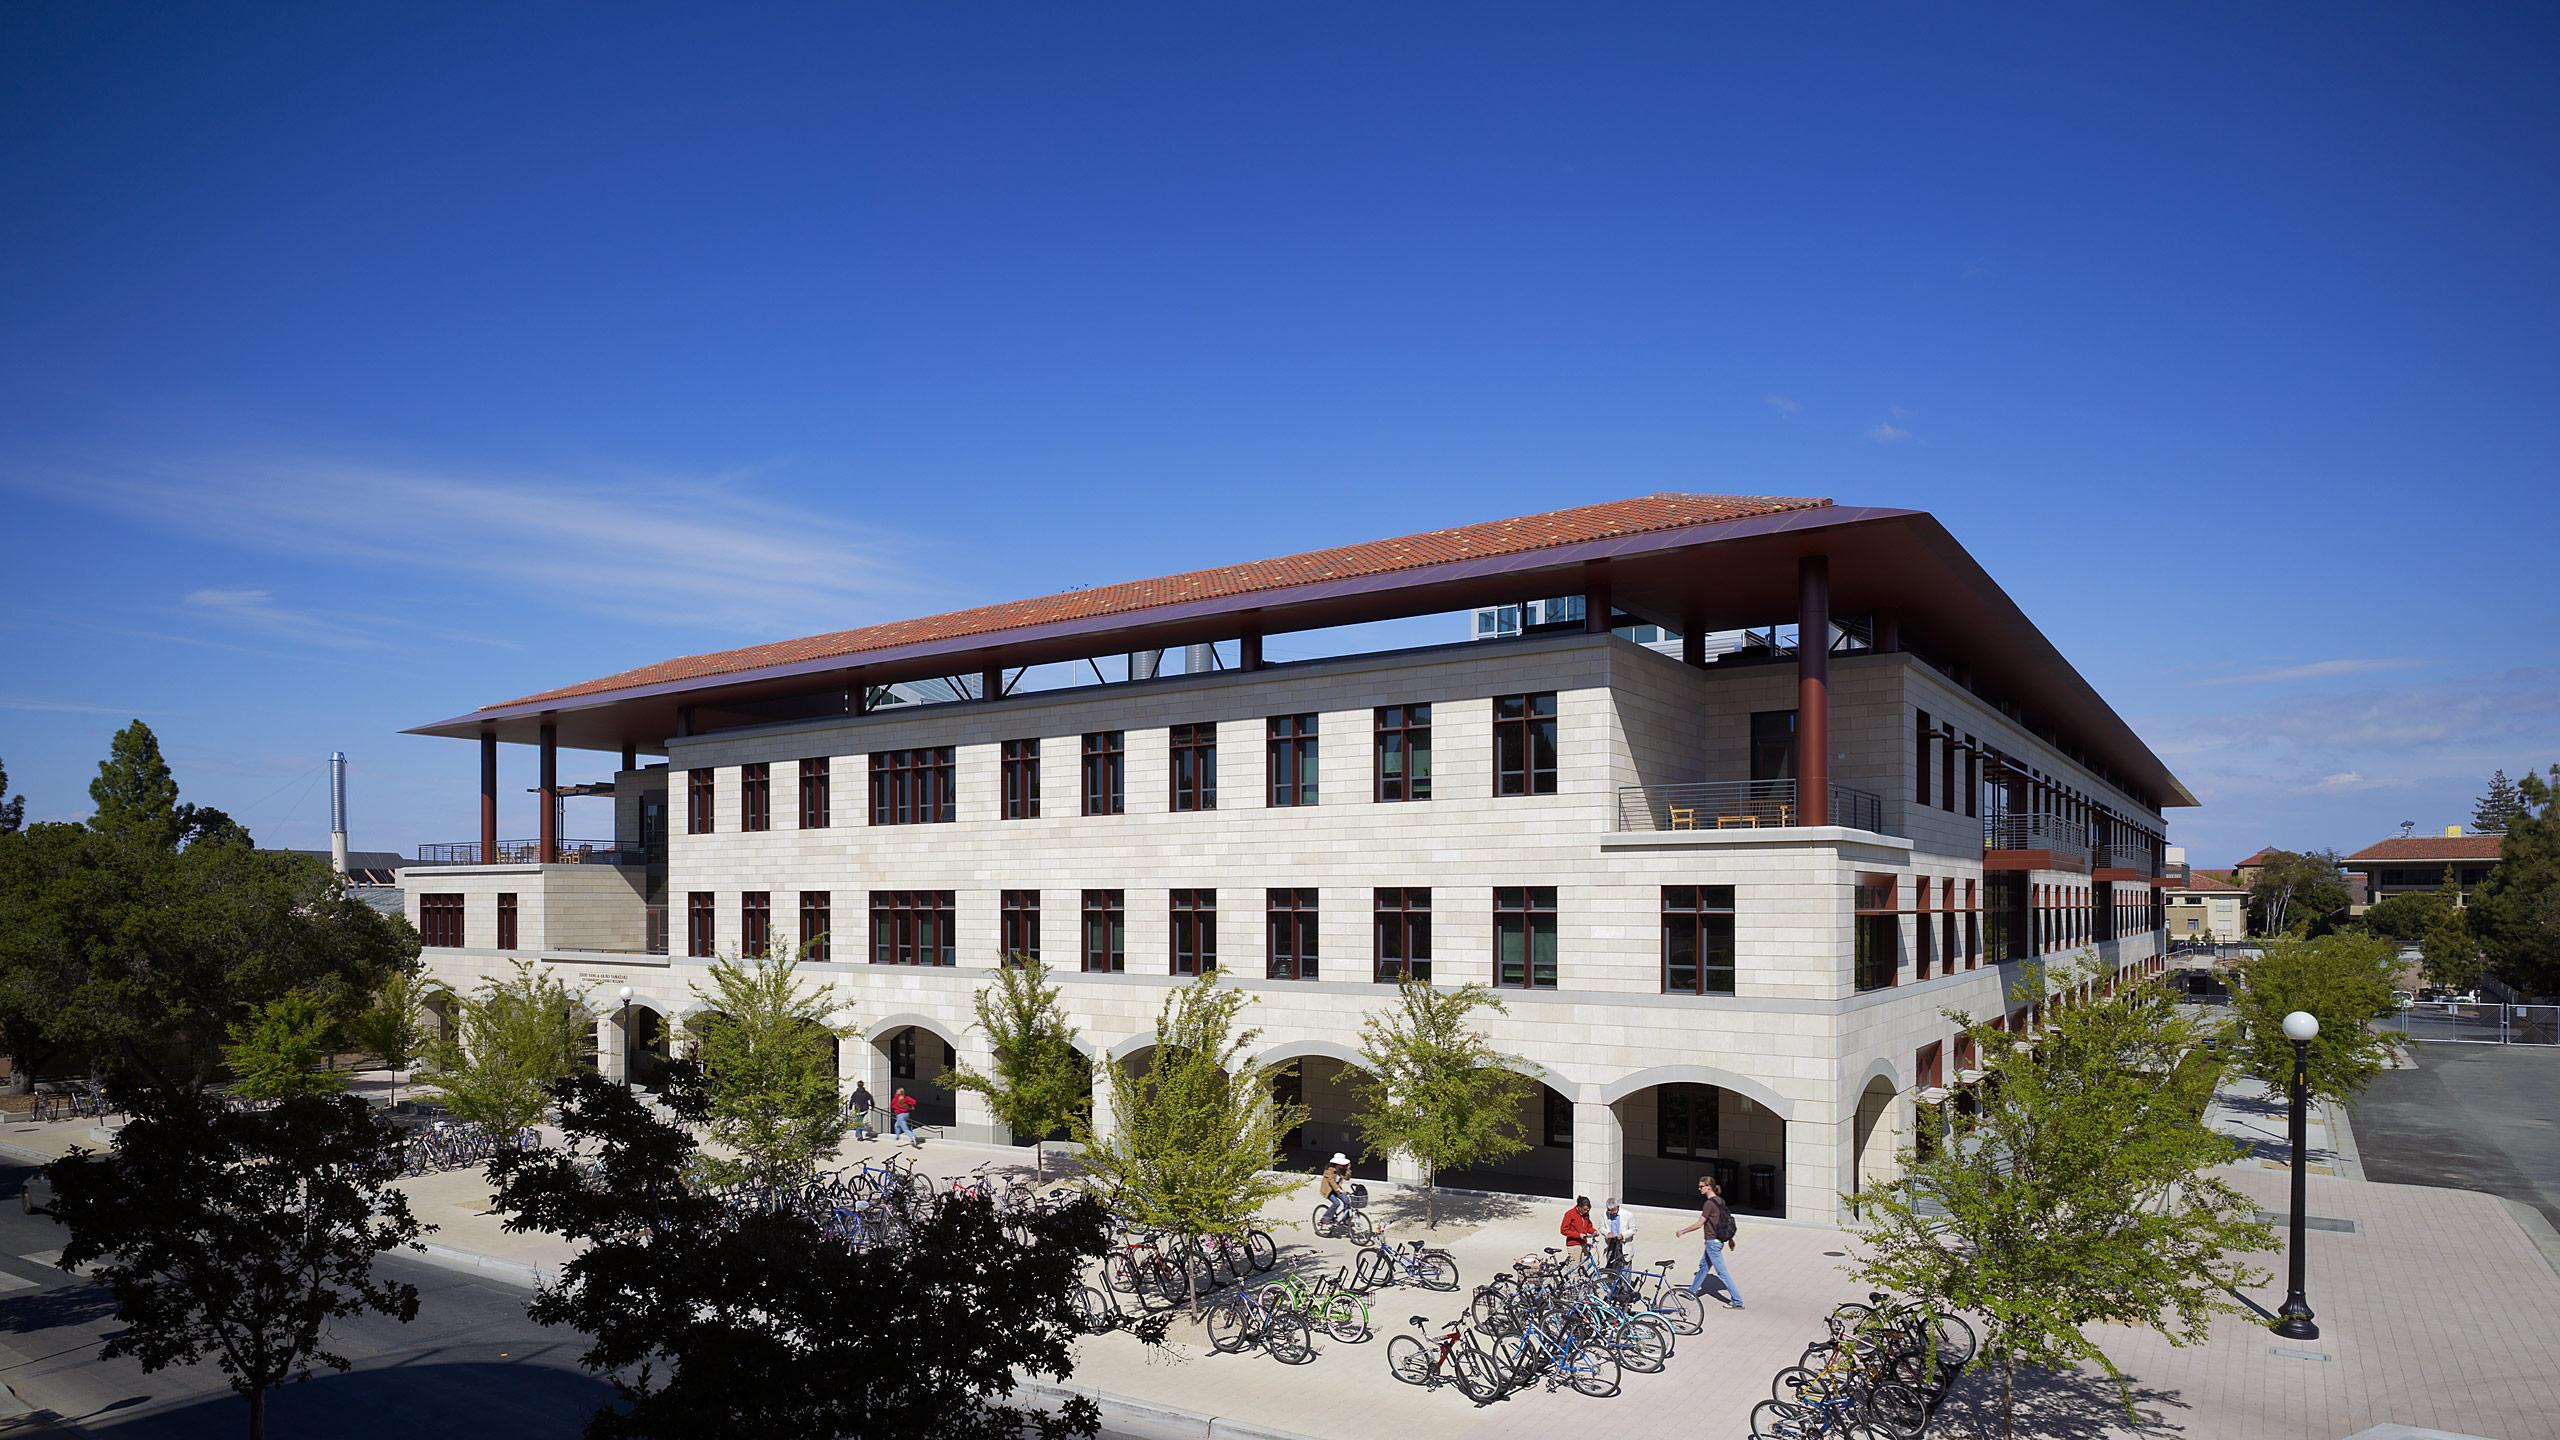 Yang and Yamazaki Environment and Energy Building – Stanford University / image 1